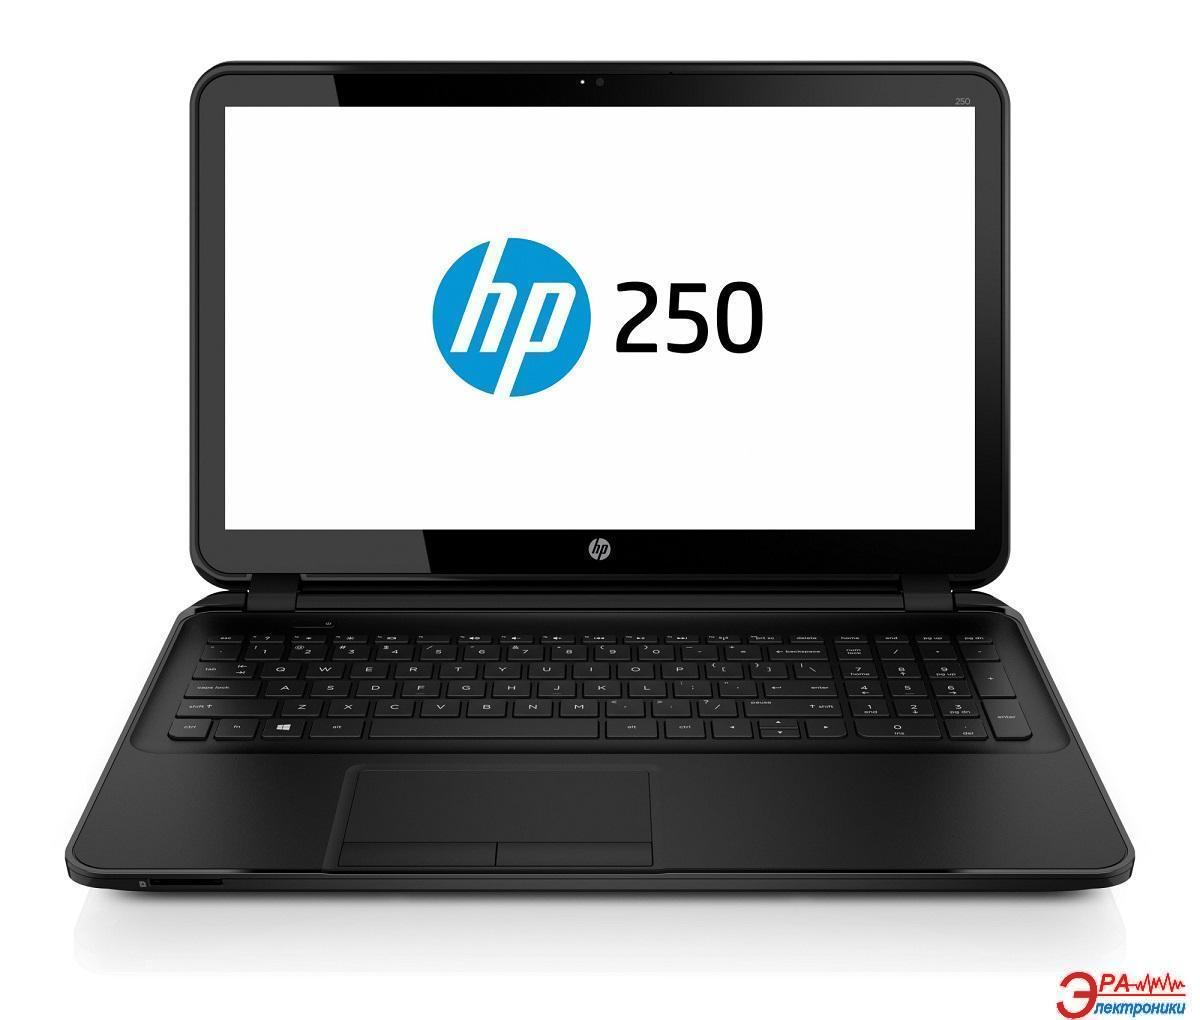 Ноутбук HP 250 G3 (K9L10ES) Black 15,6